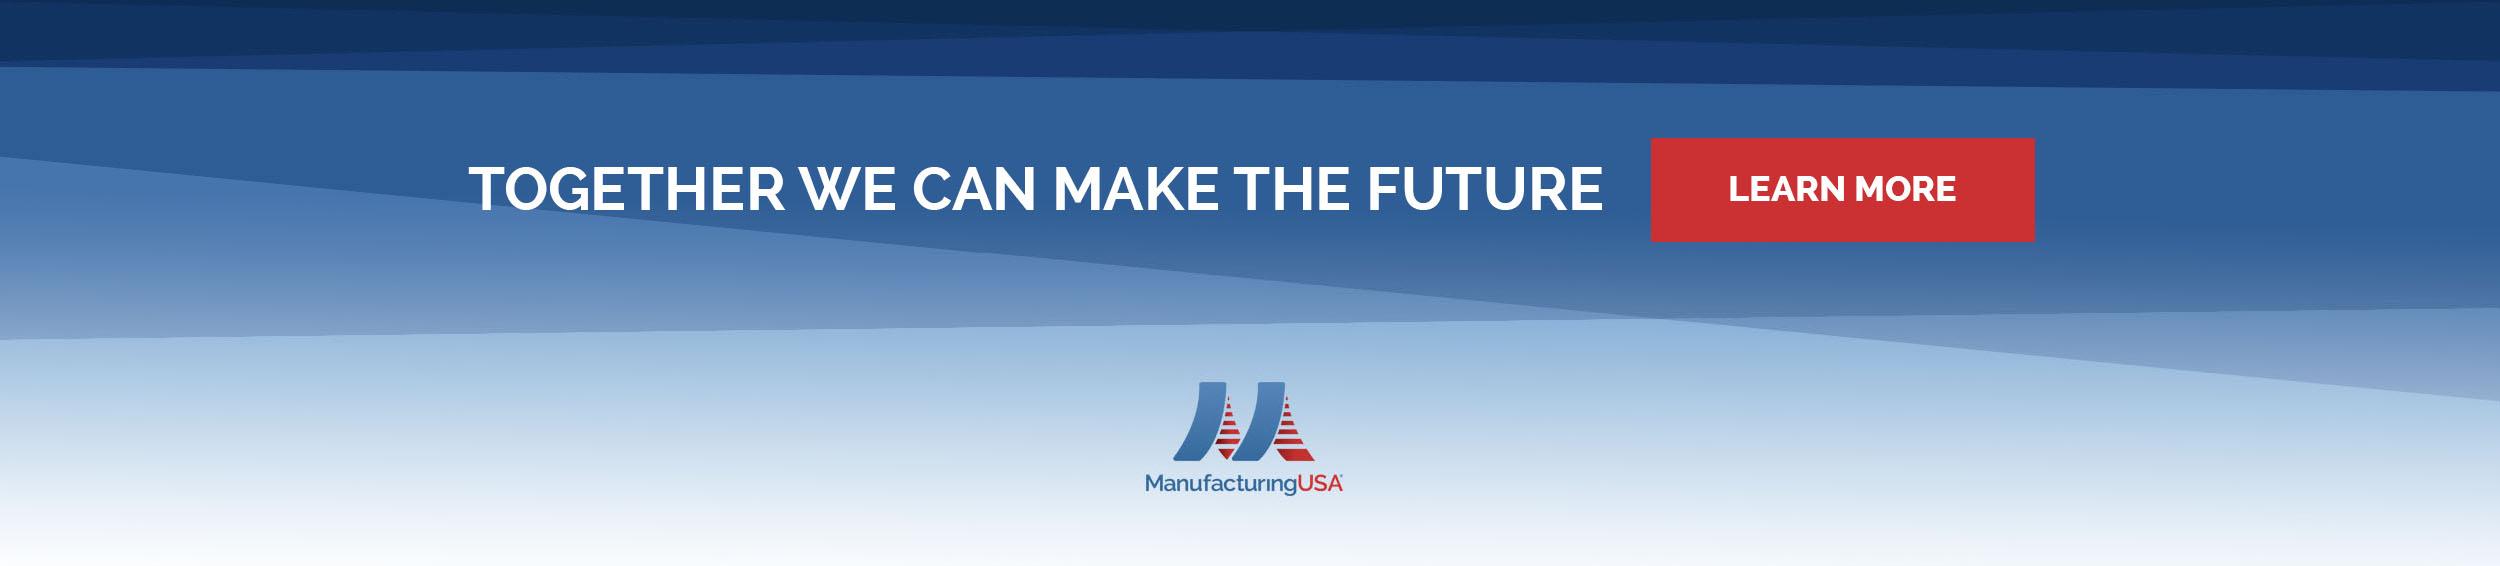 Manufacturing USA image link